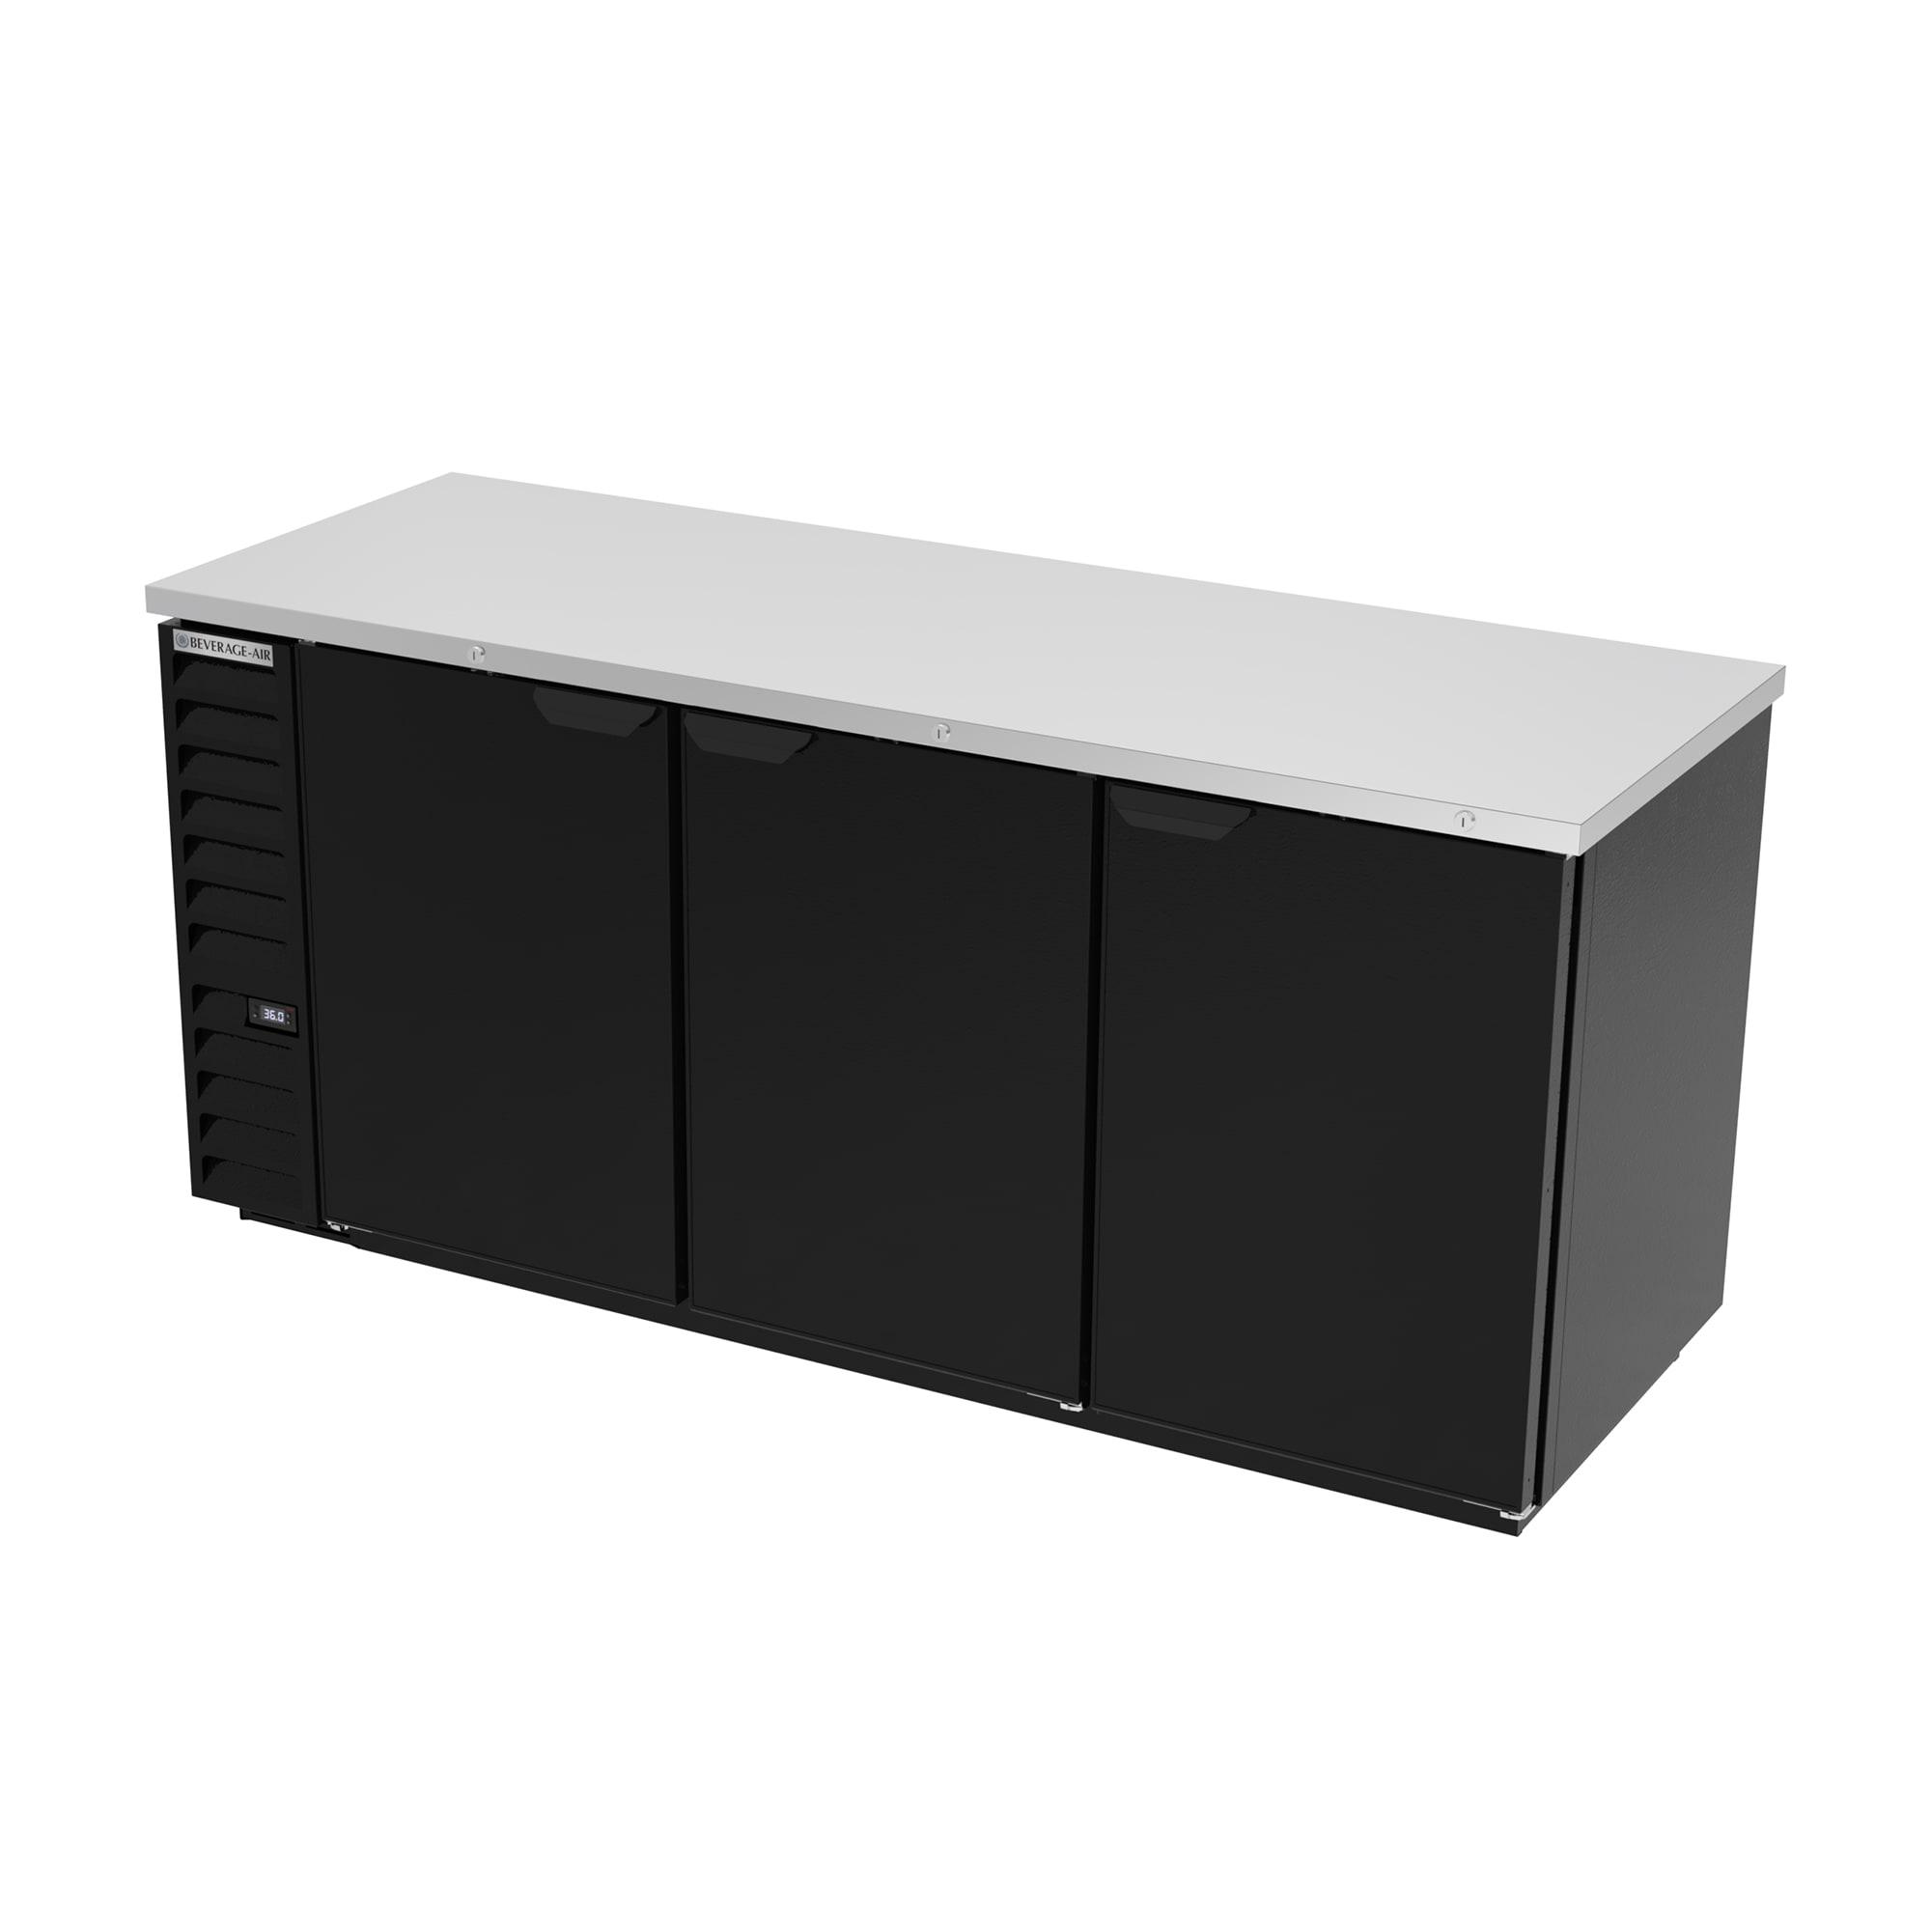 "Beverage Air BB78HC-1-B 79"" (3) Section Bar Refrigerator - Swinging Solid Door, 115v"